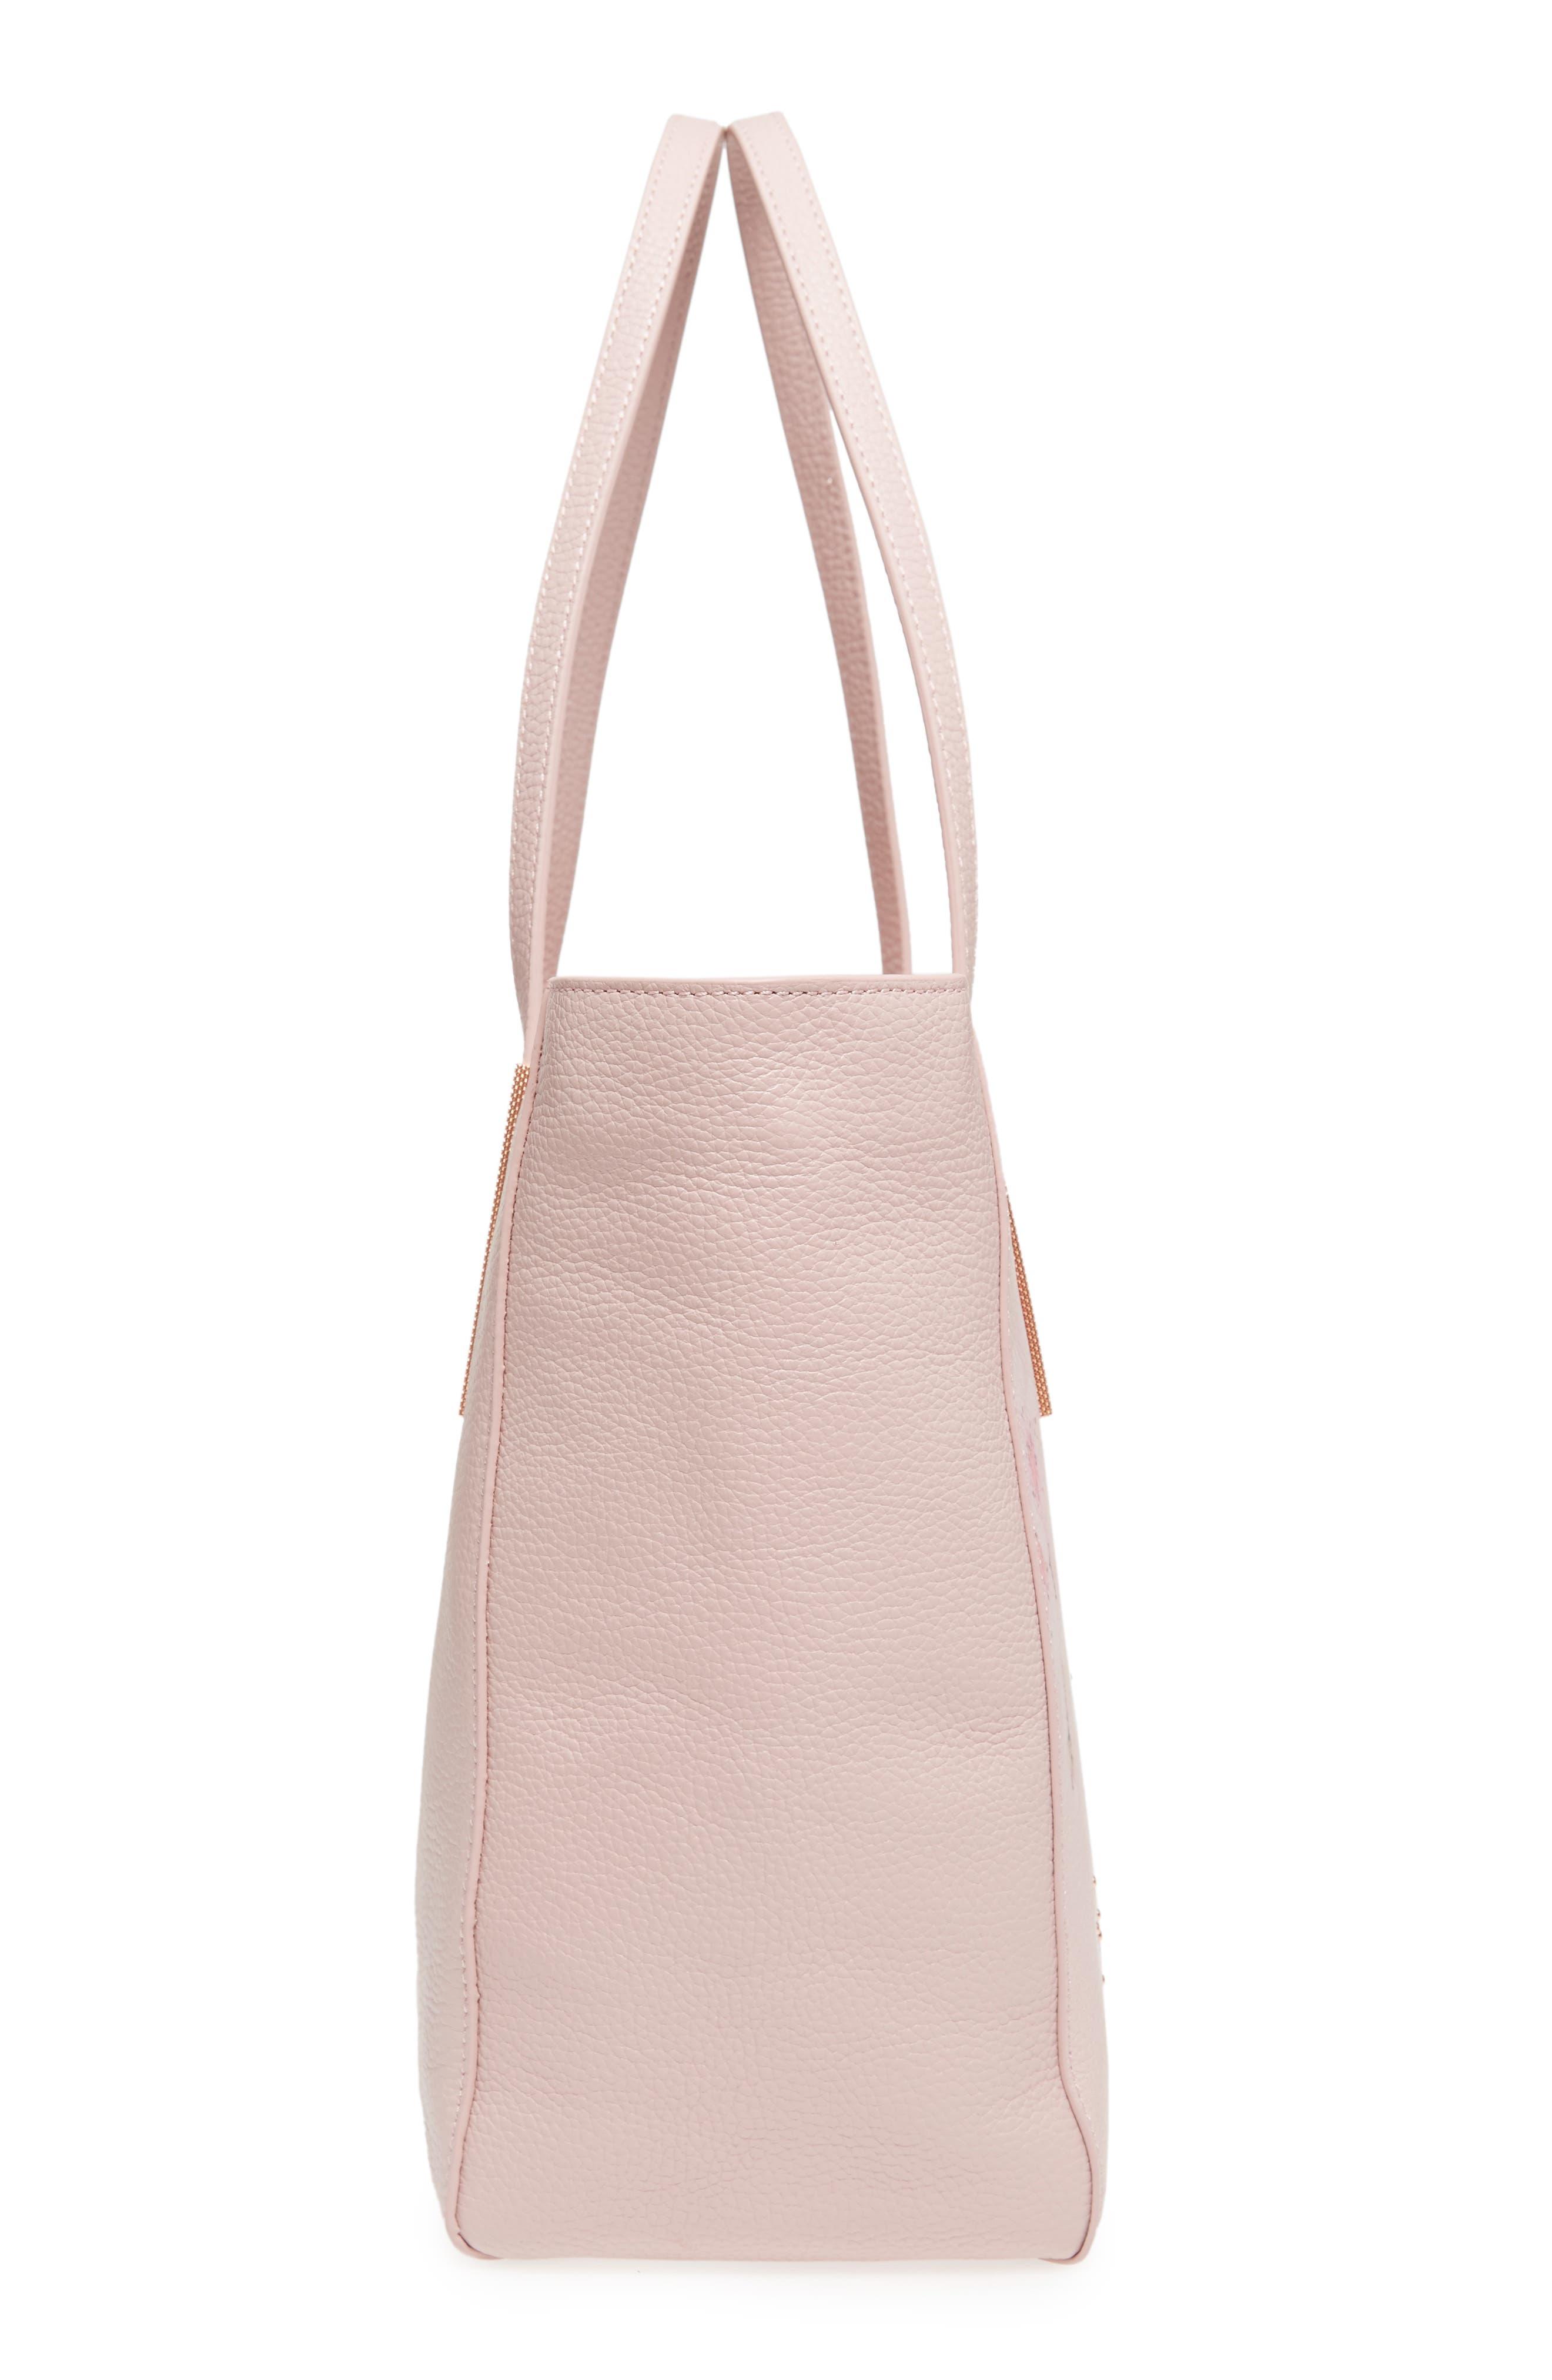 Soft Blossom Leather Shopper,                             Alternate thumbnail 5, color,                             Light Pink